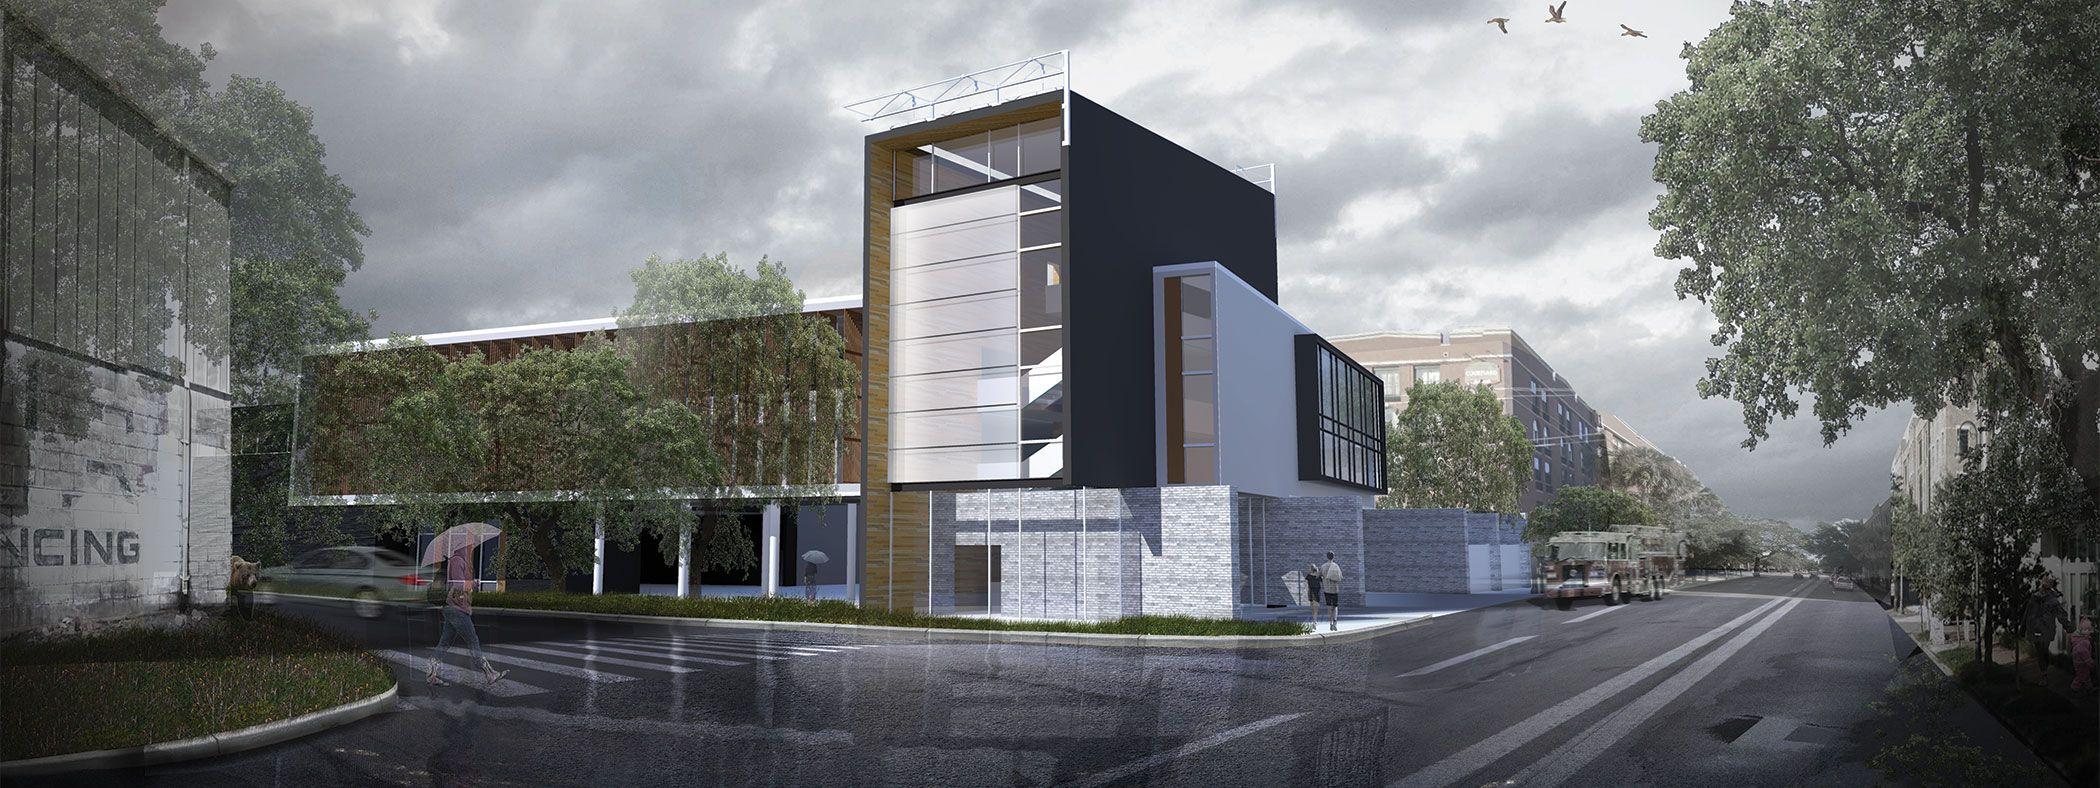 Master of Architecture School of Architecture